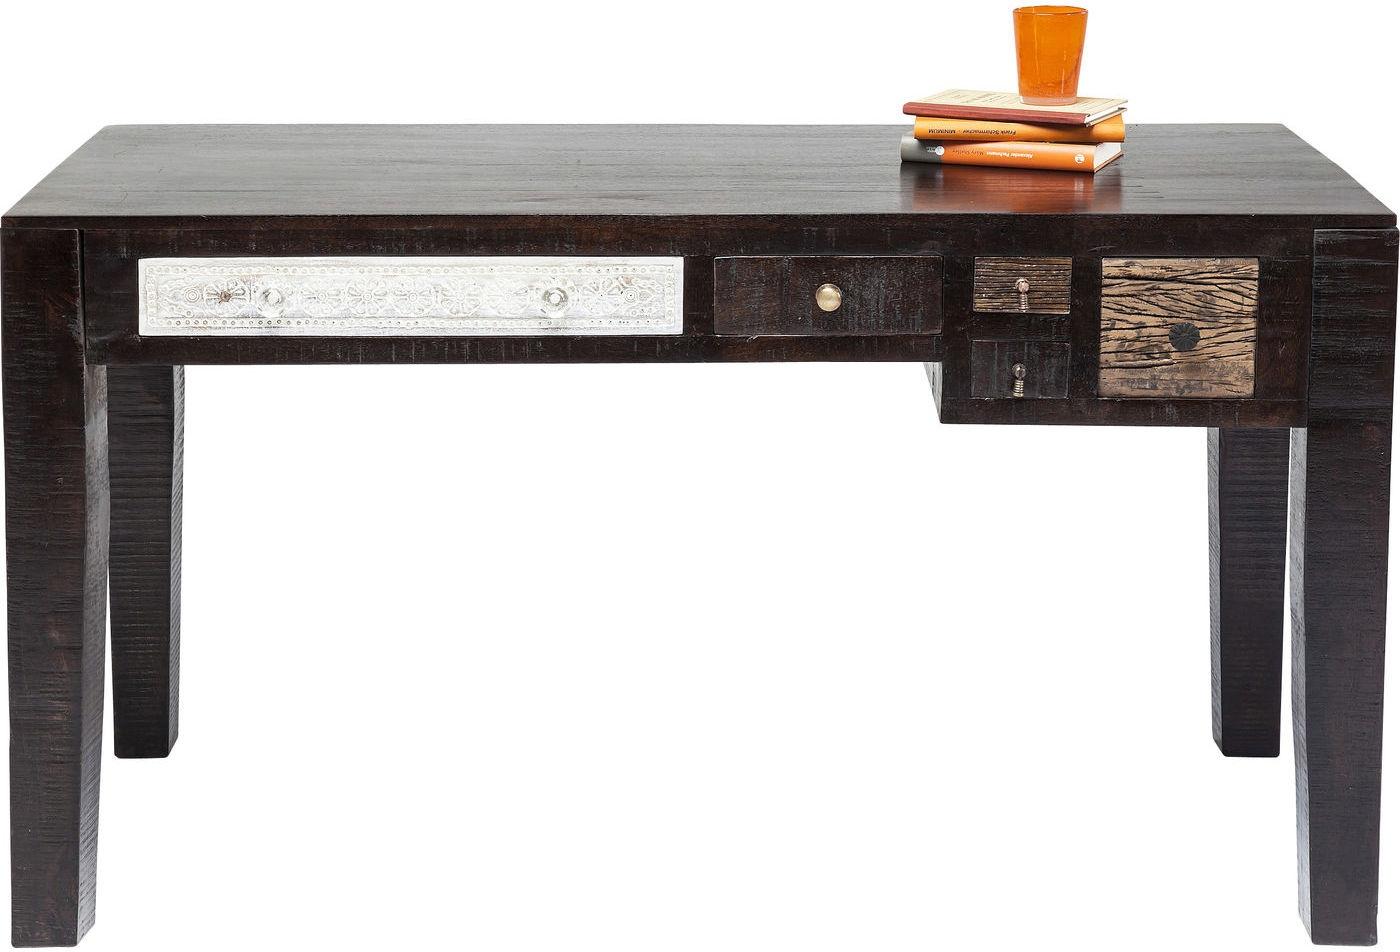 Kare Design Bureau Finca - L135 X B60 X H78 Cm - Mangohout